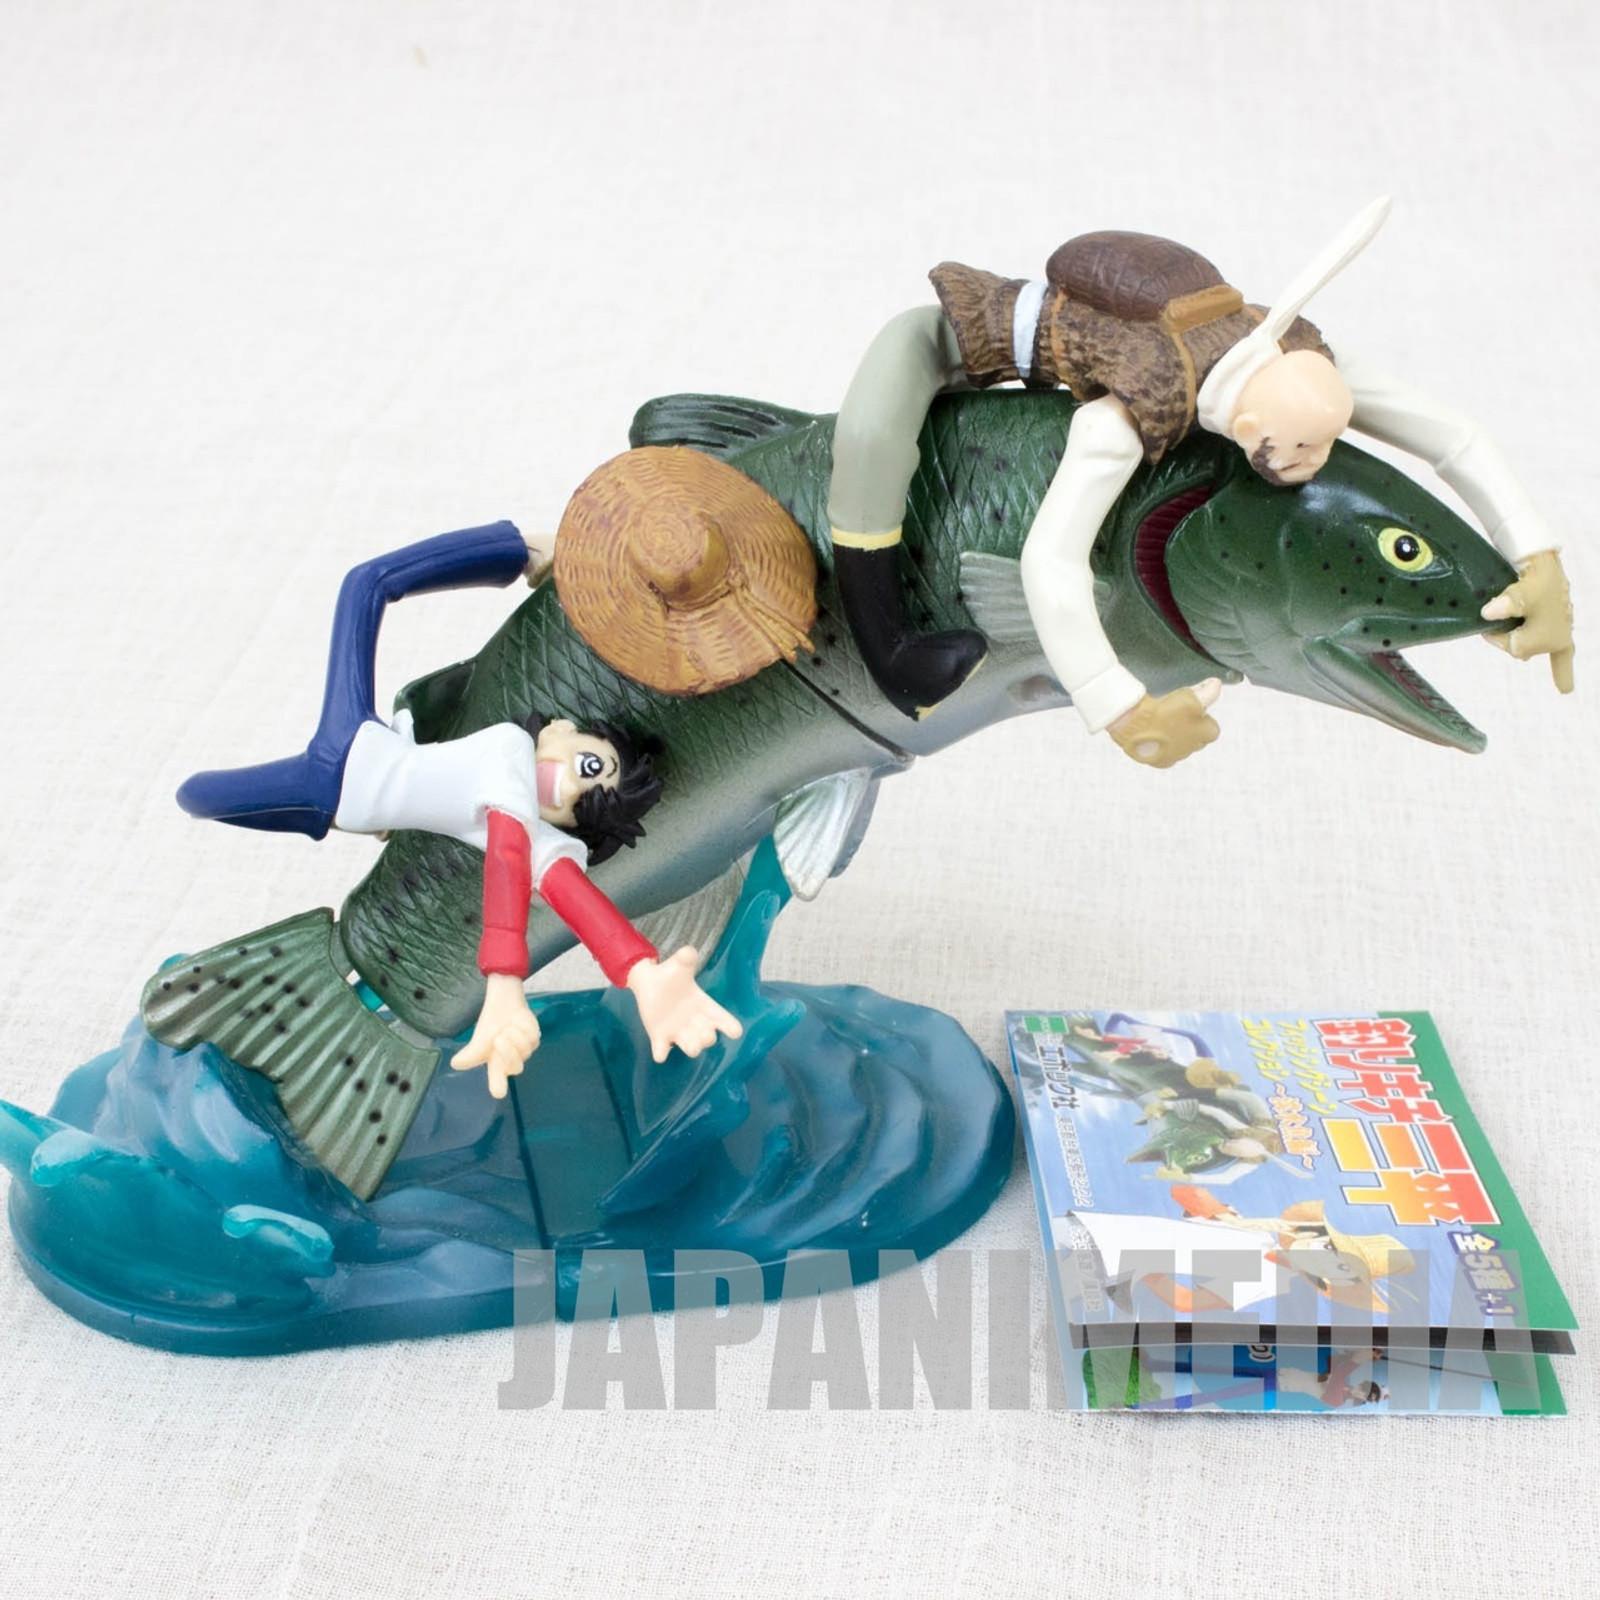 Fishing Crazy Tsurikichi Sanpei Diorama Vignette Figure JAPAN ANIME MANGA